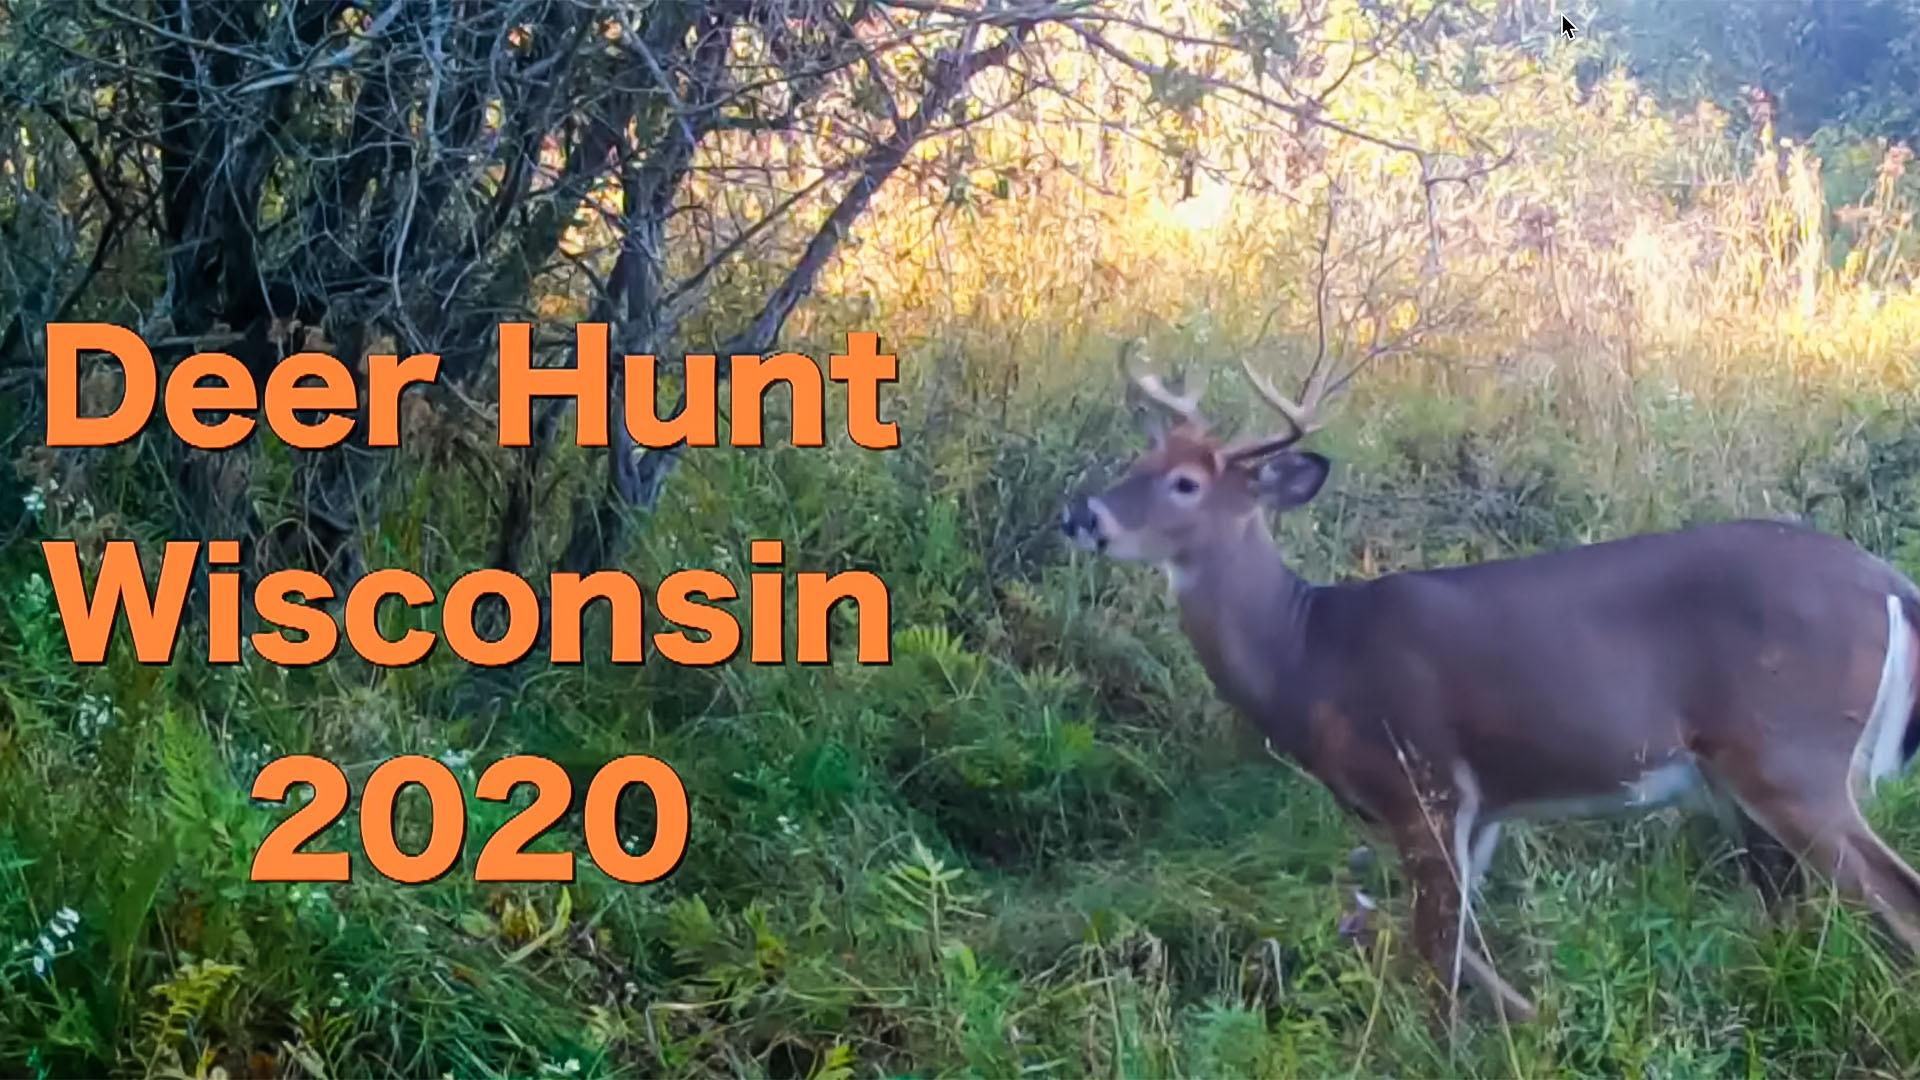 Wisconsin videos